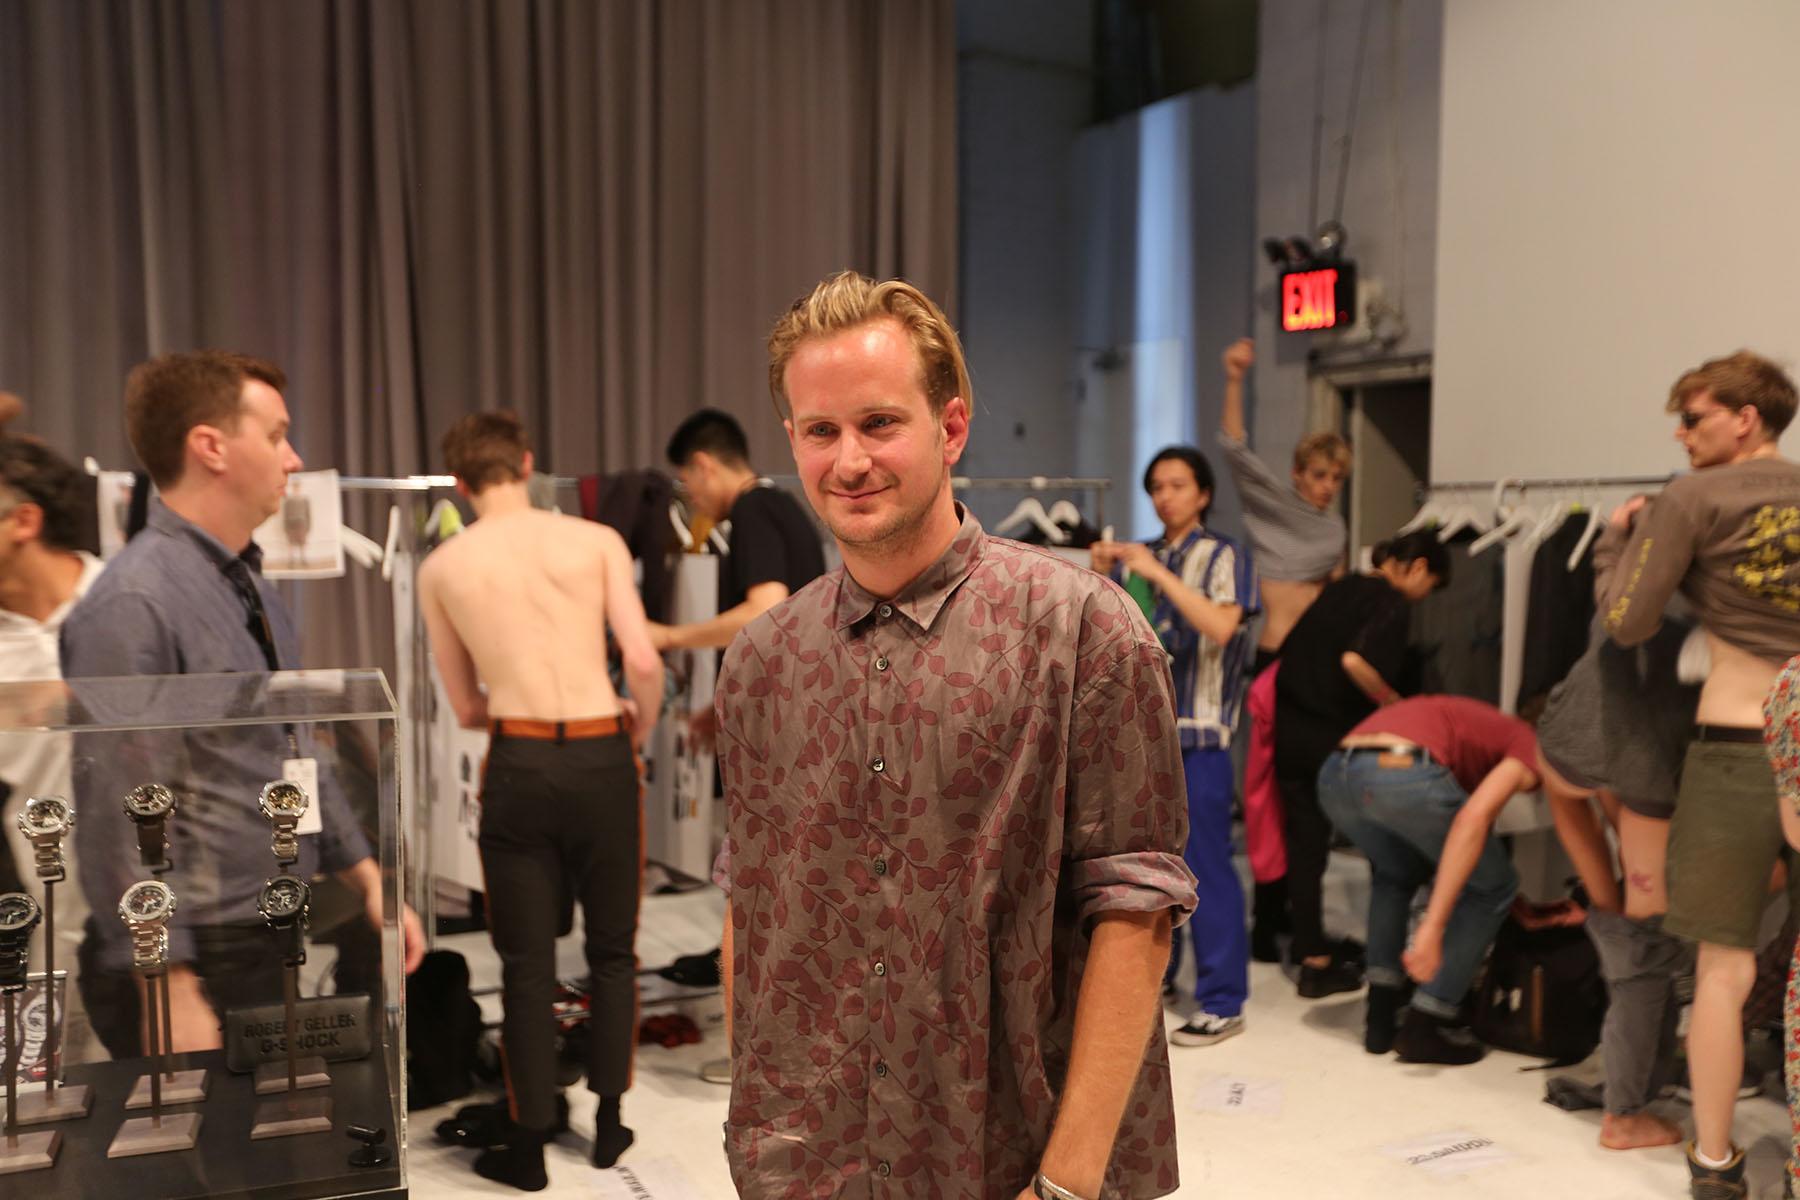 Robert-Geller-fashion-show-backstage-spring-2017-the-impression-050